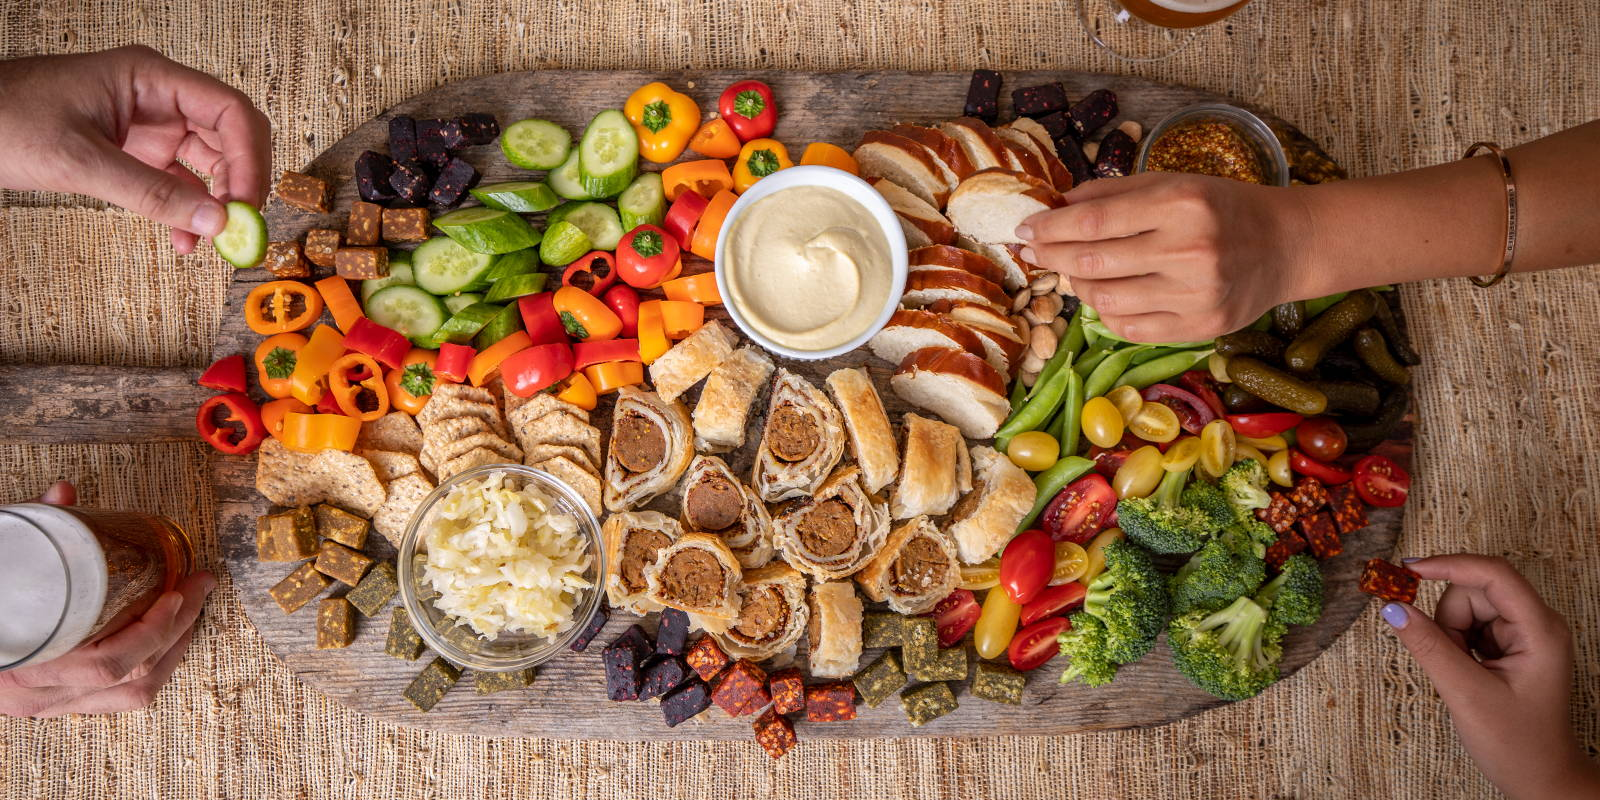 Big Oktoberfest party board for grazing on vegan, plant-based snacks.